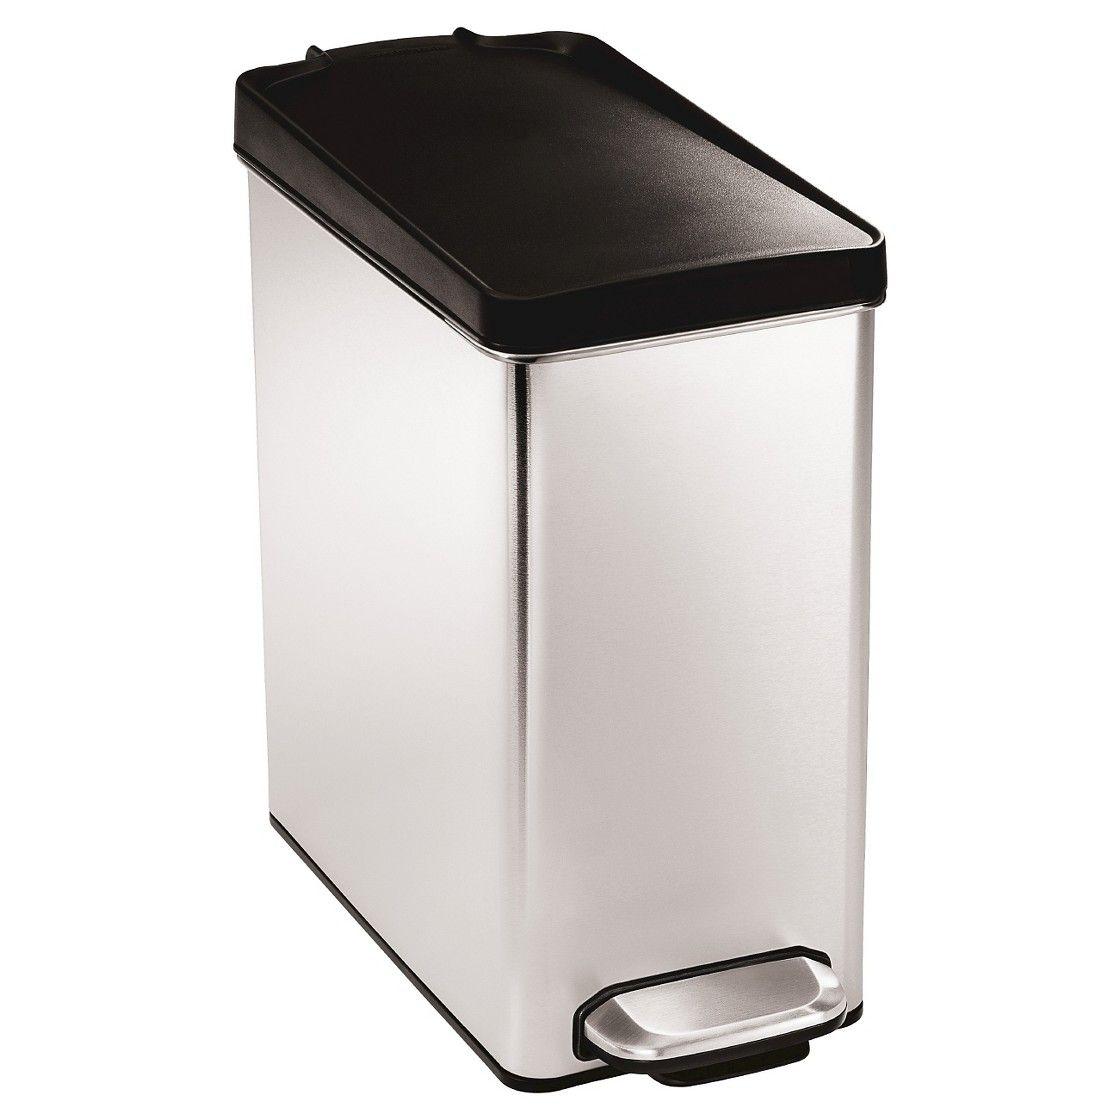 Simplehuman Studio 10 Liter Profile Step Trash Can In Brushed